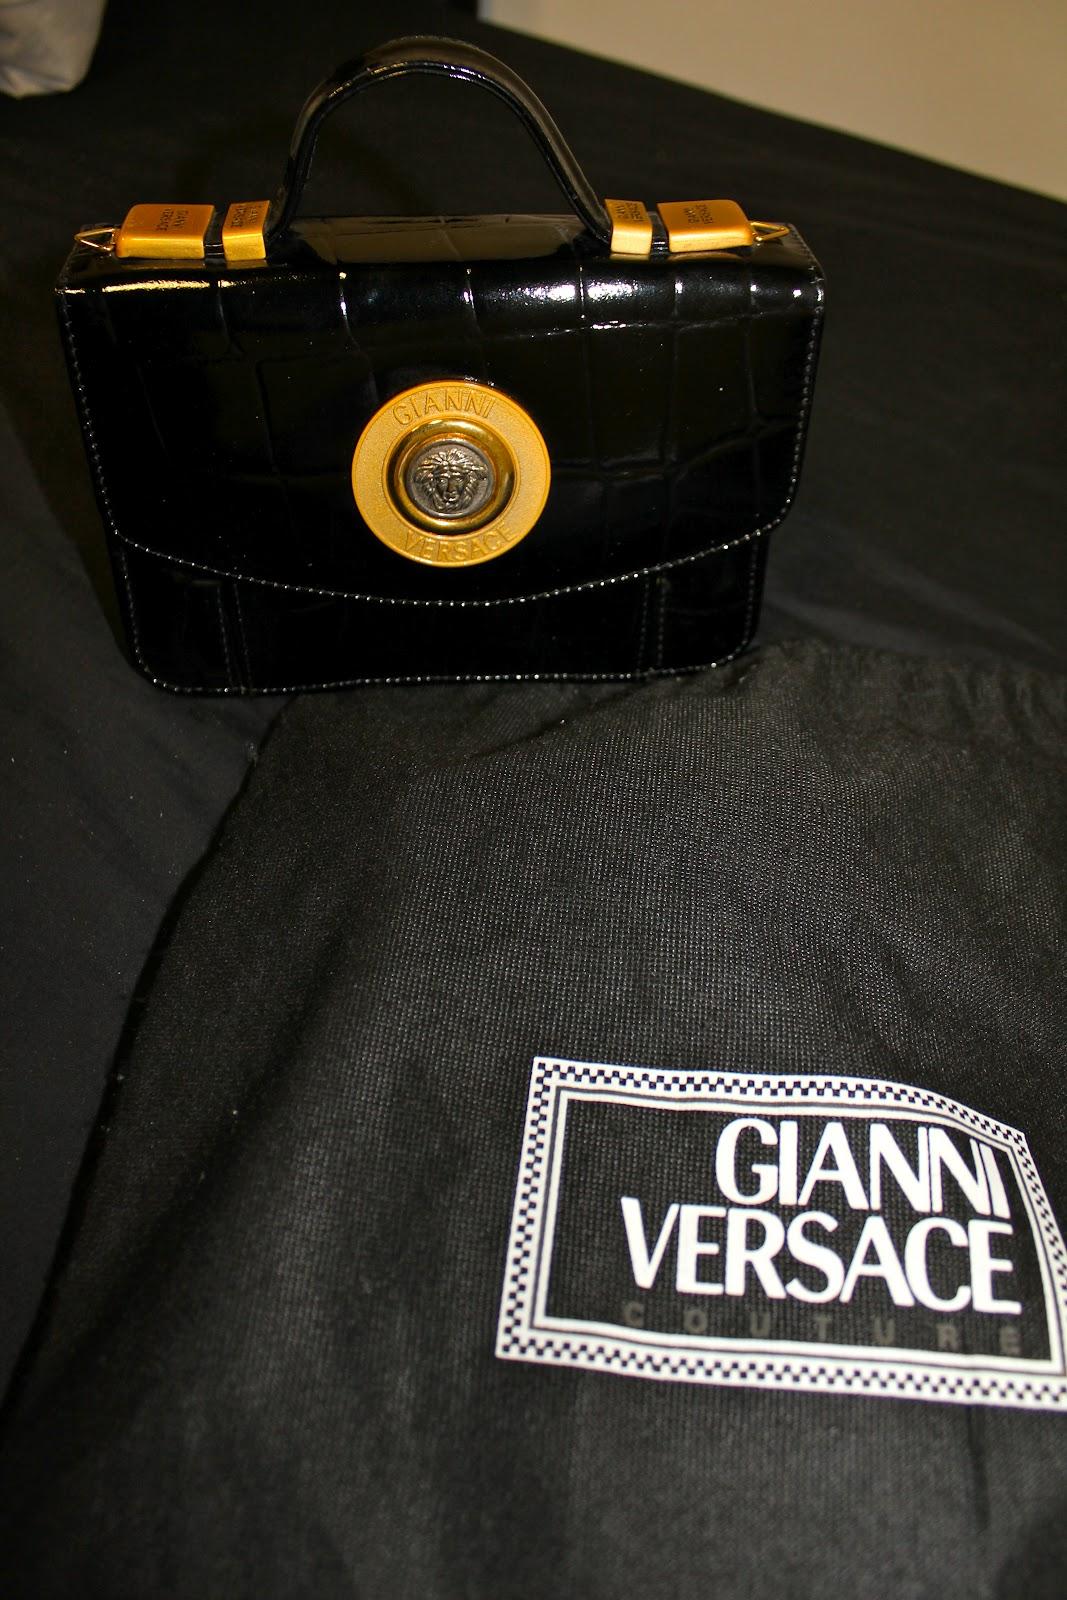 00d3dd1a58 vintage Gianni Versace bag with golden details - £450